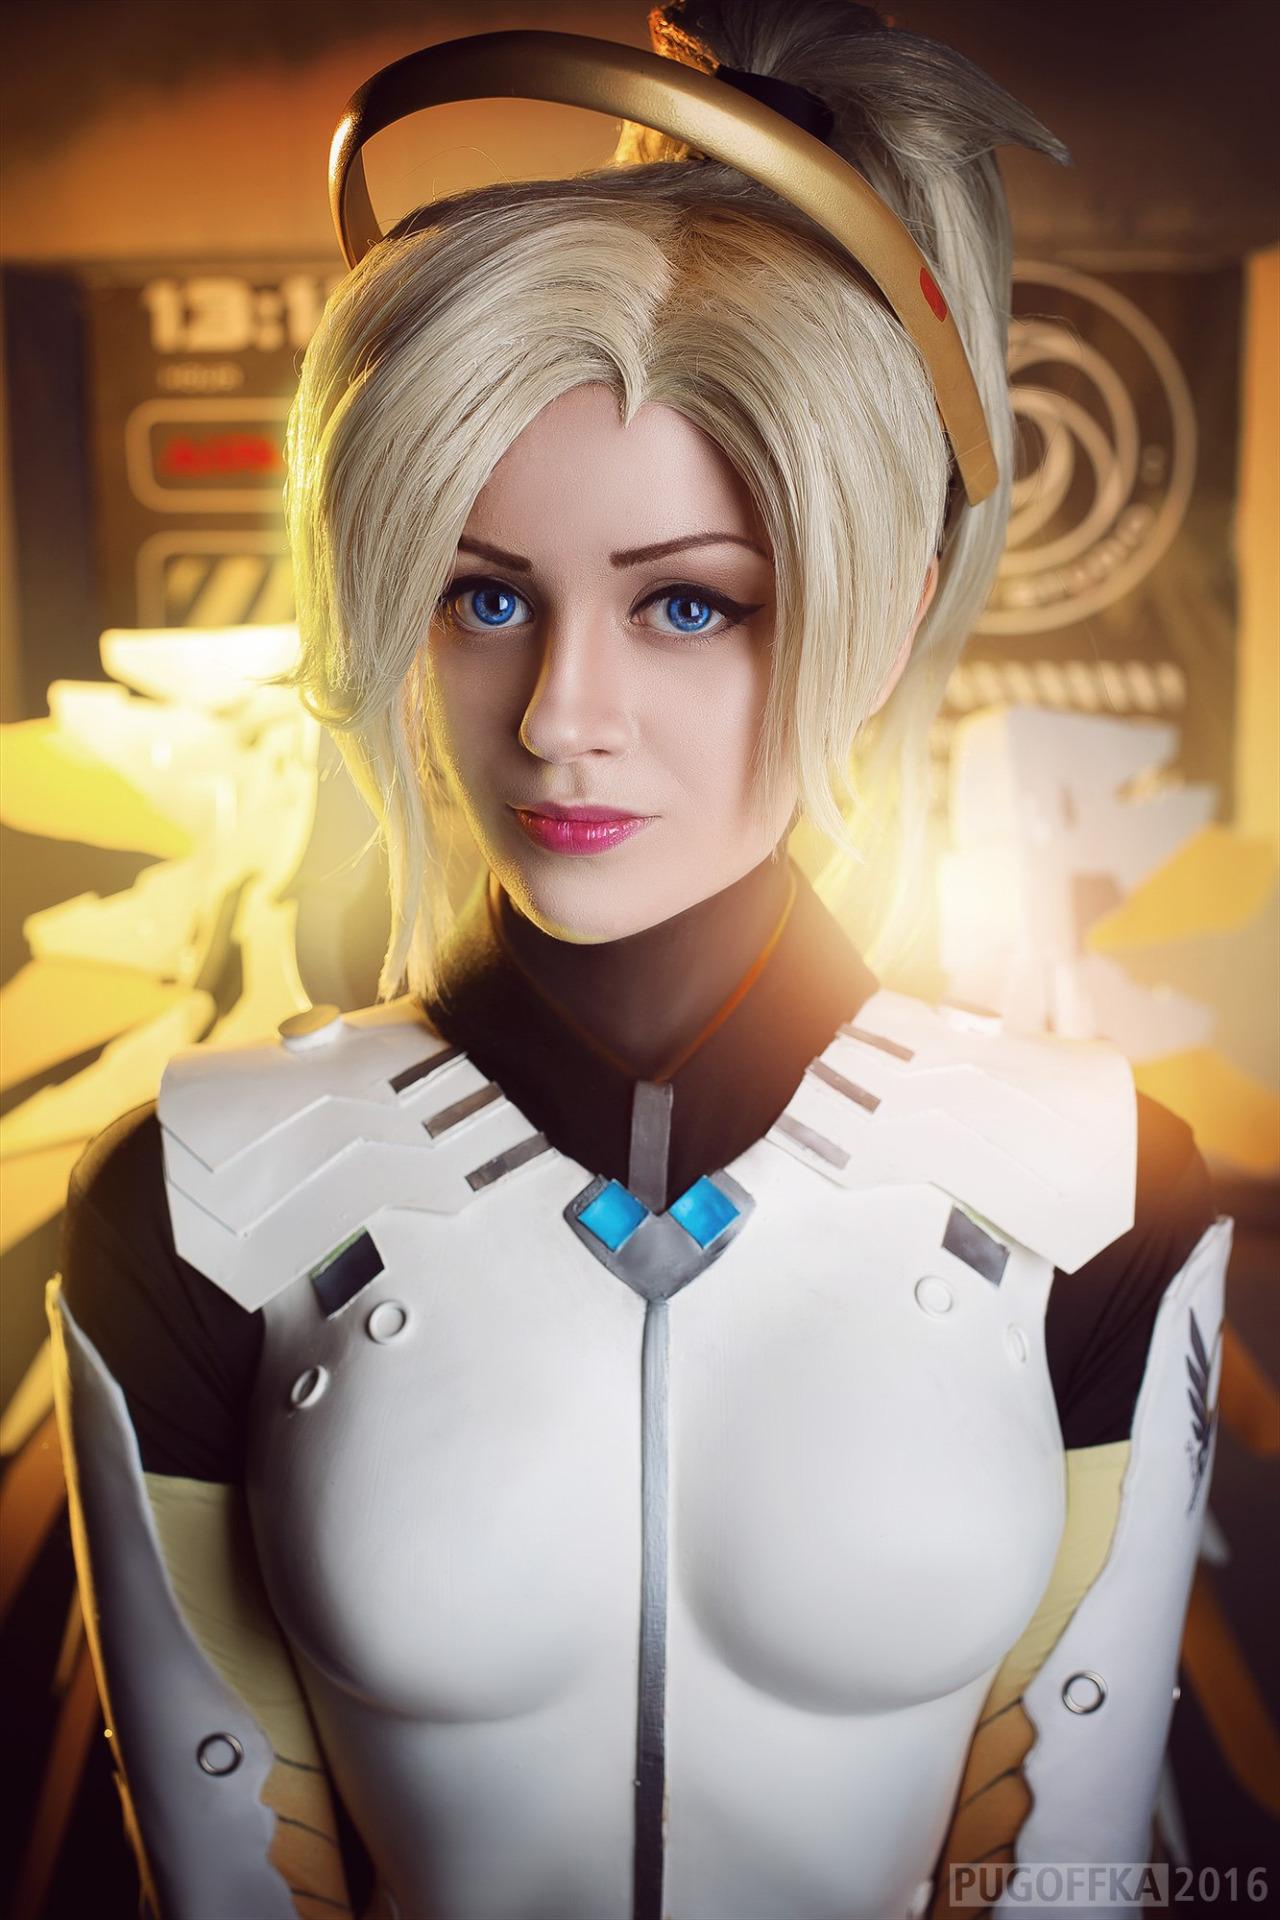 tumblr_okaww0bWpt1r5udeko1_1280 Cosplay - Overwatch - Mercy #142